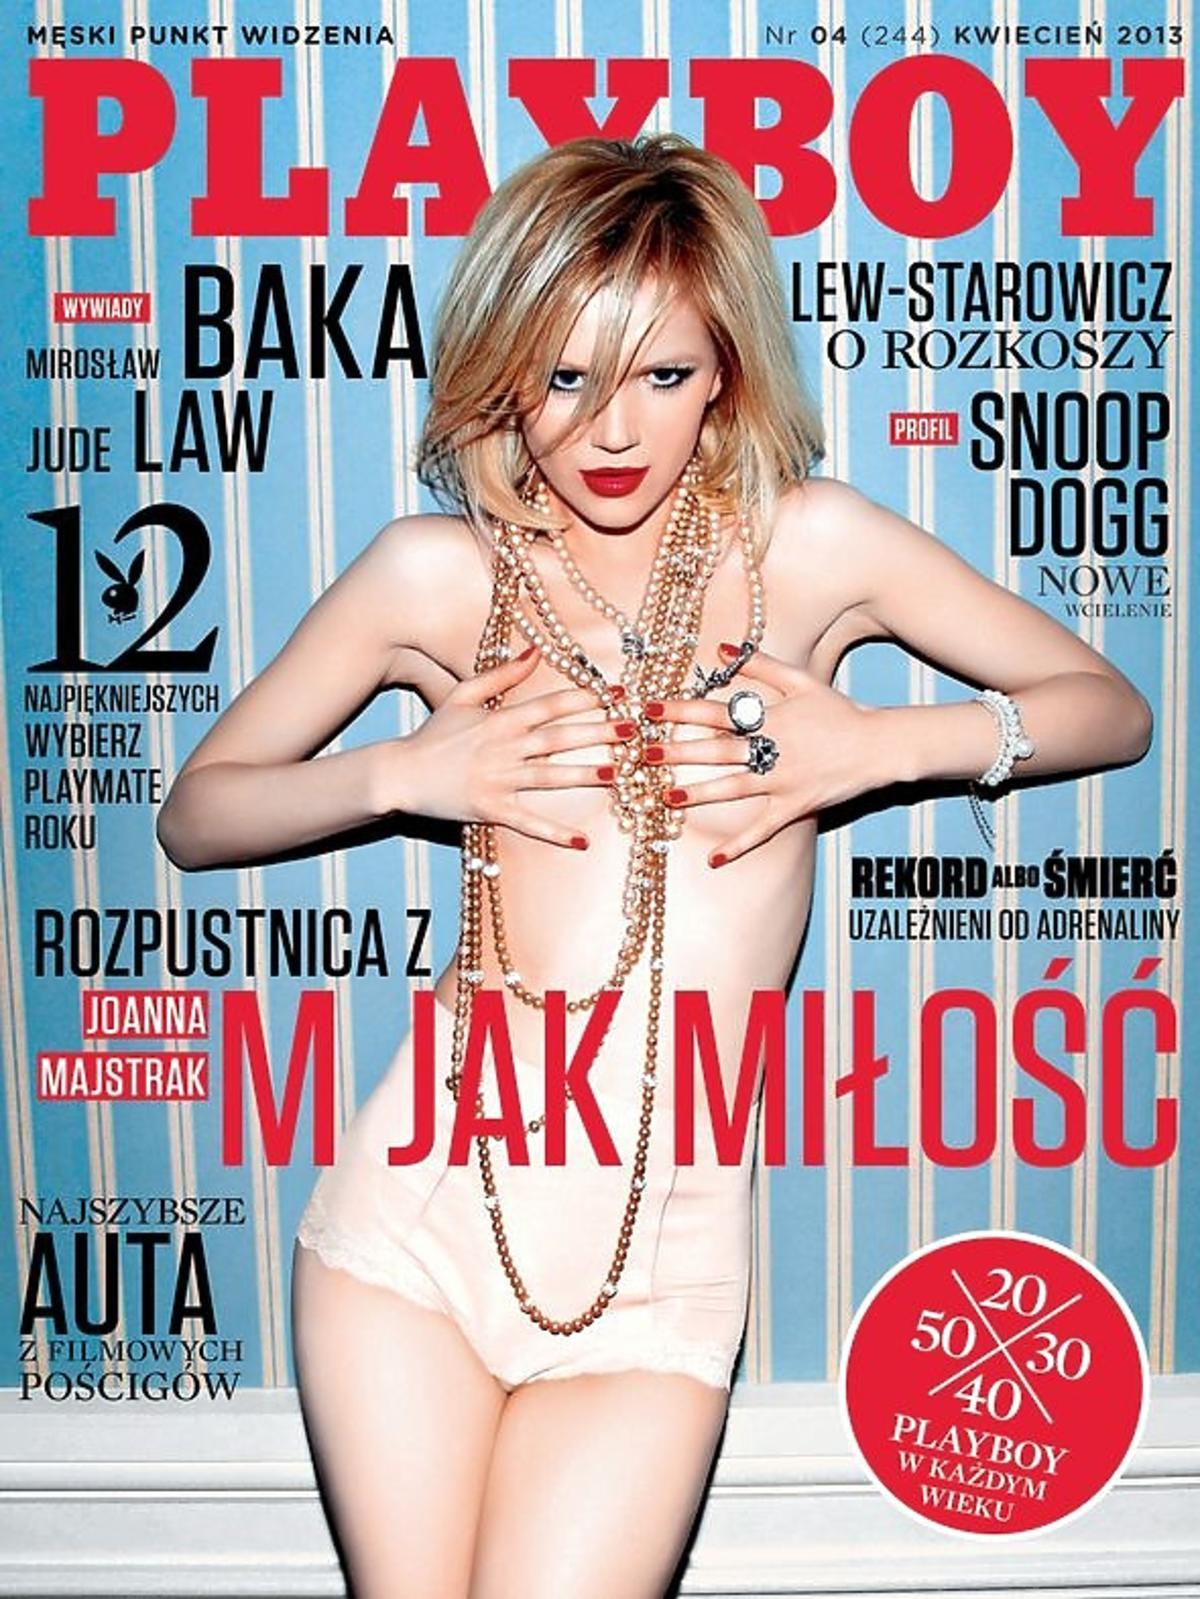 Joanna Majstrak na okładce Playboya. Joanna Majstrak nago